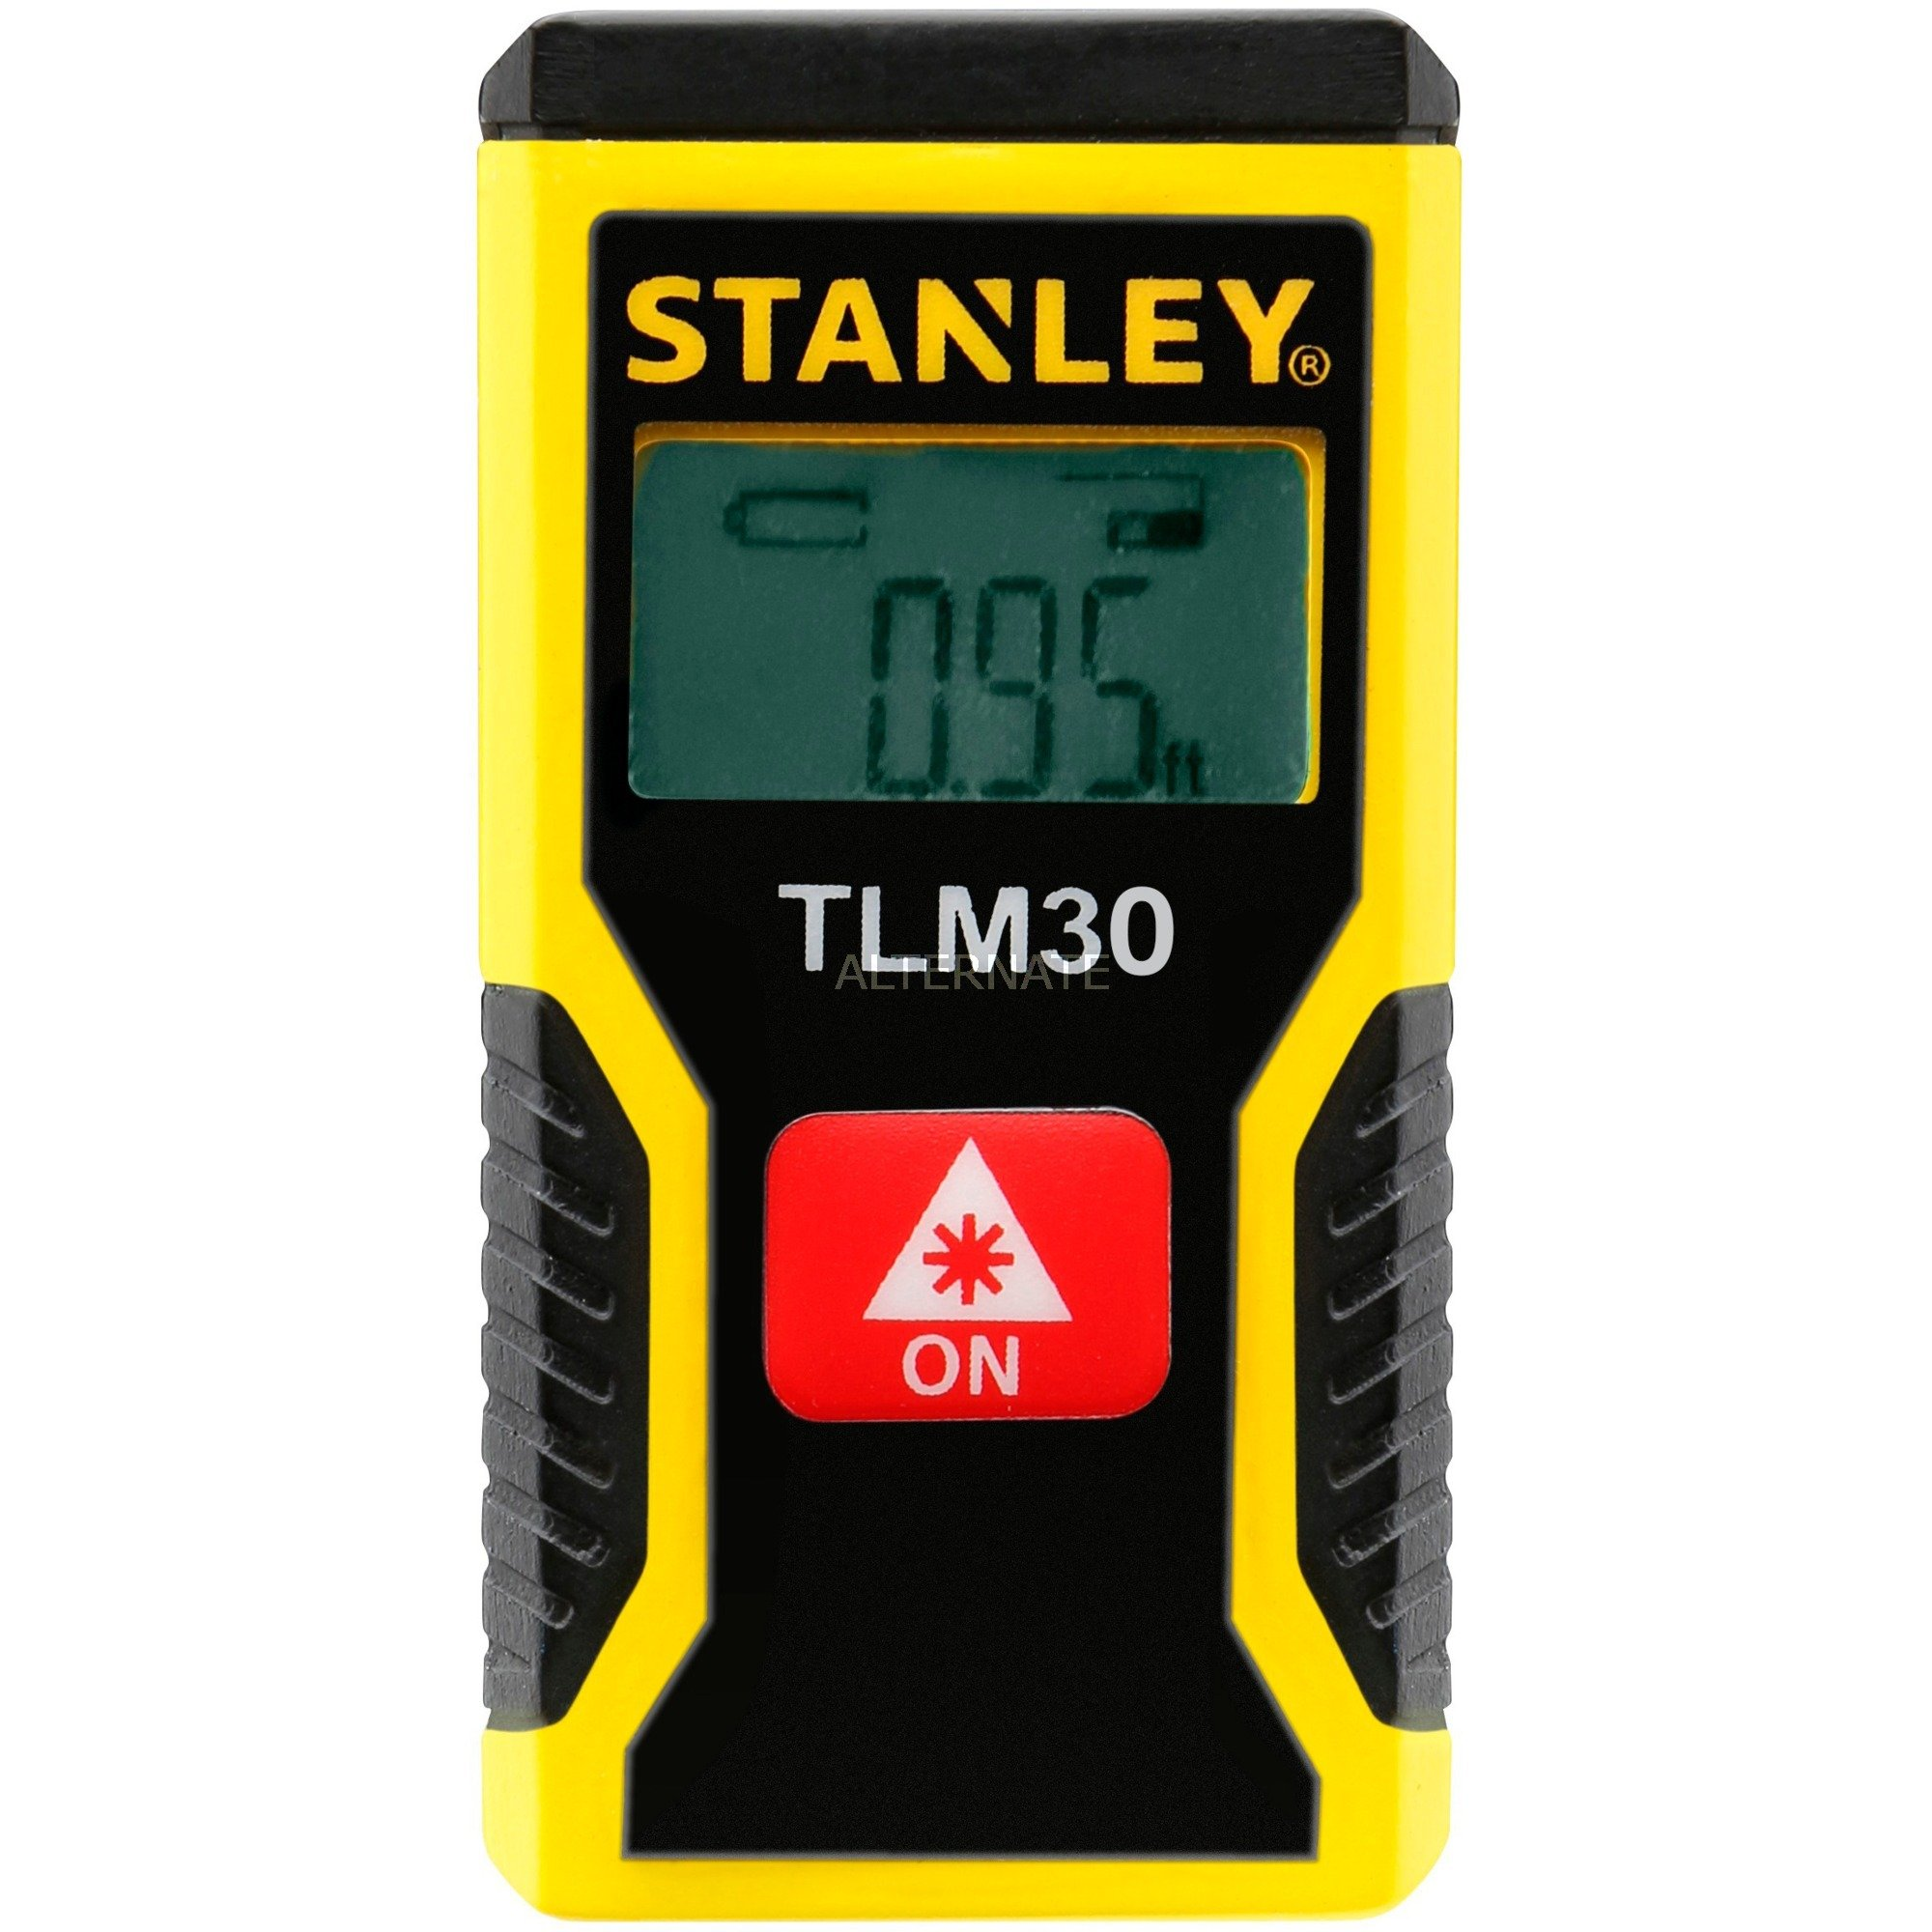 TLM30 Medidor láser de distancias 9 m Negro, Amarillo, Telémetro